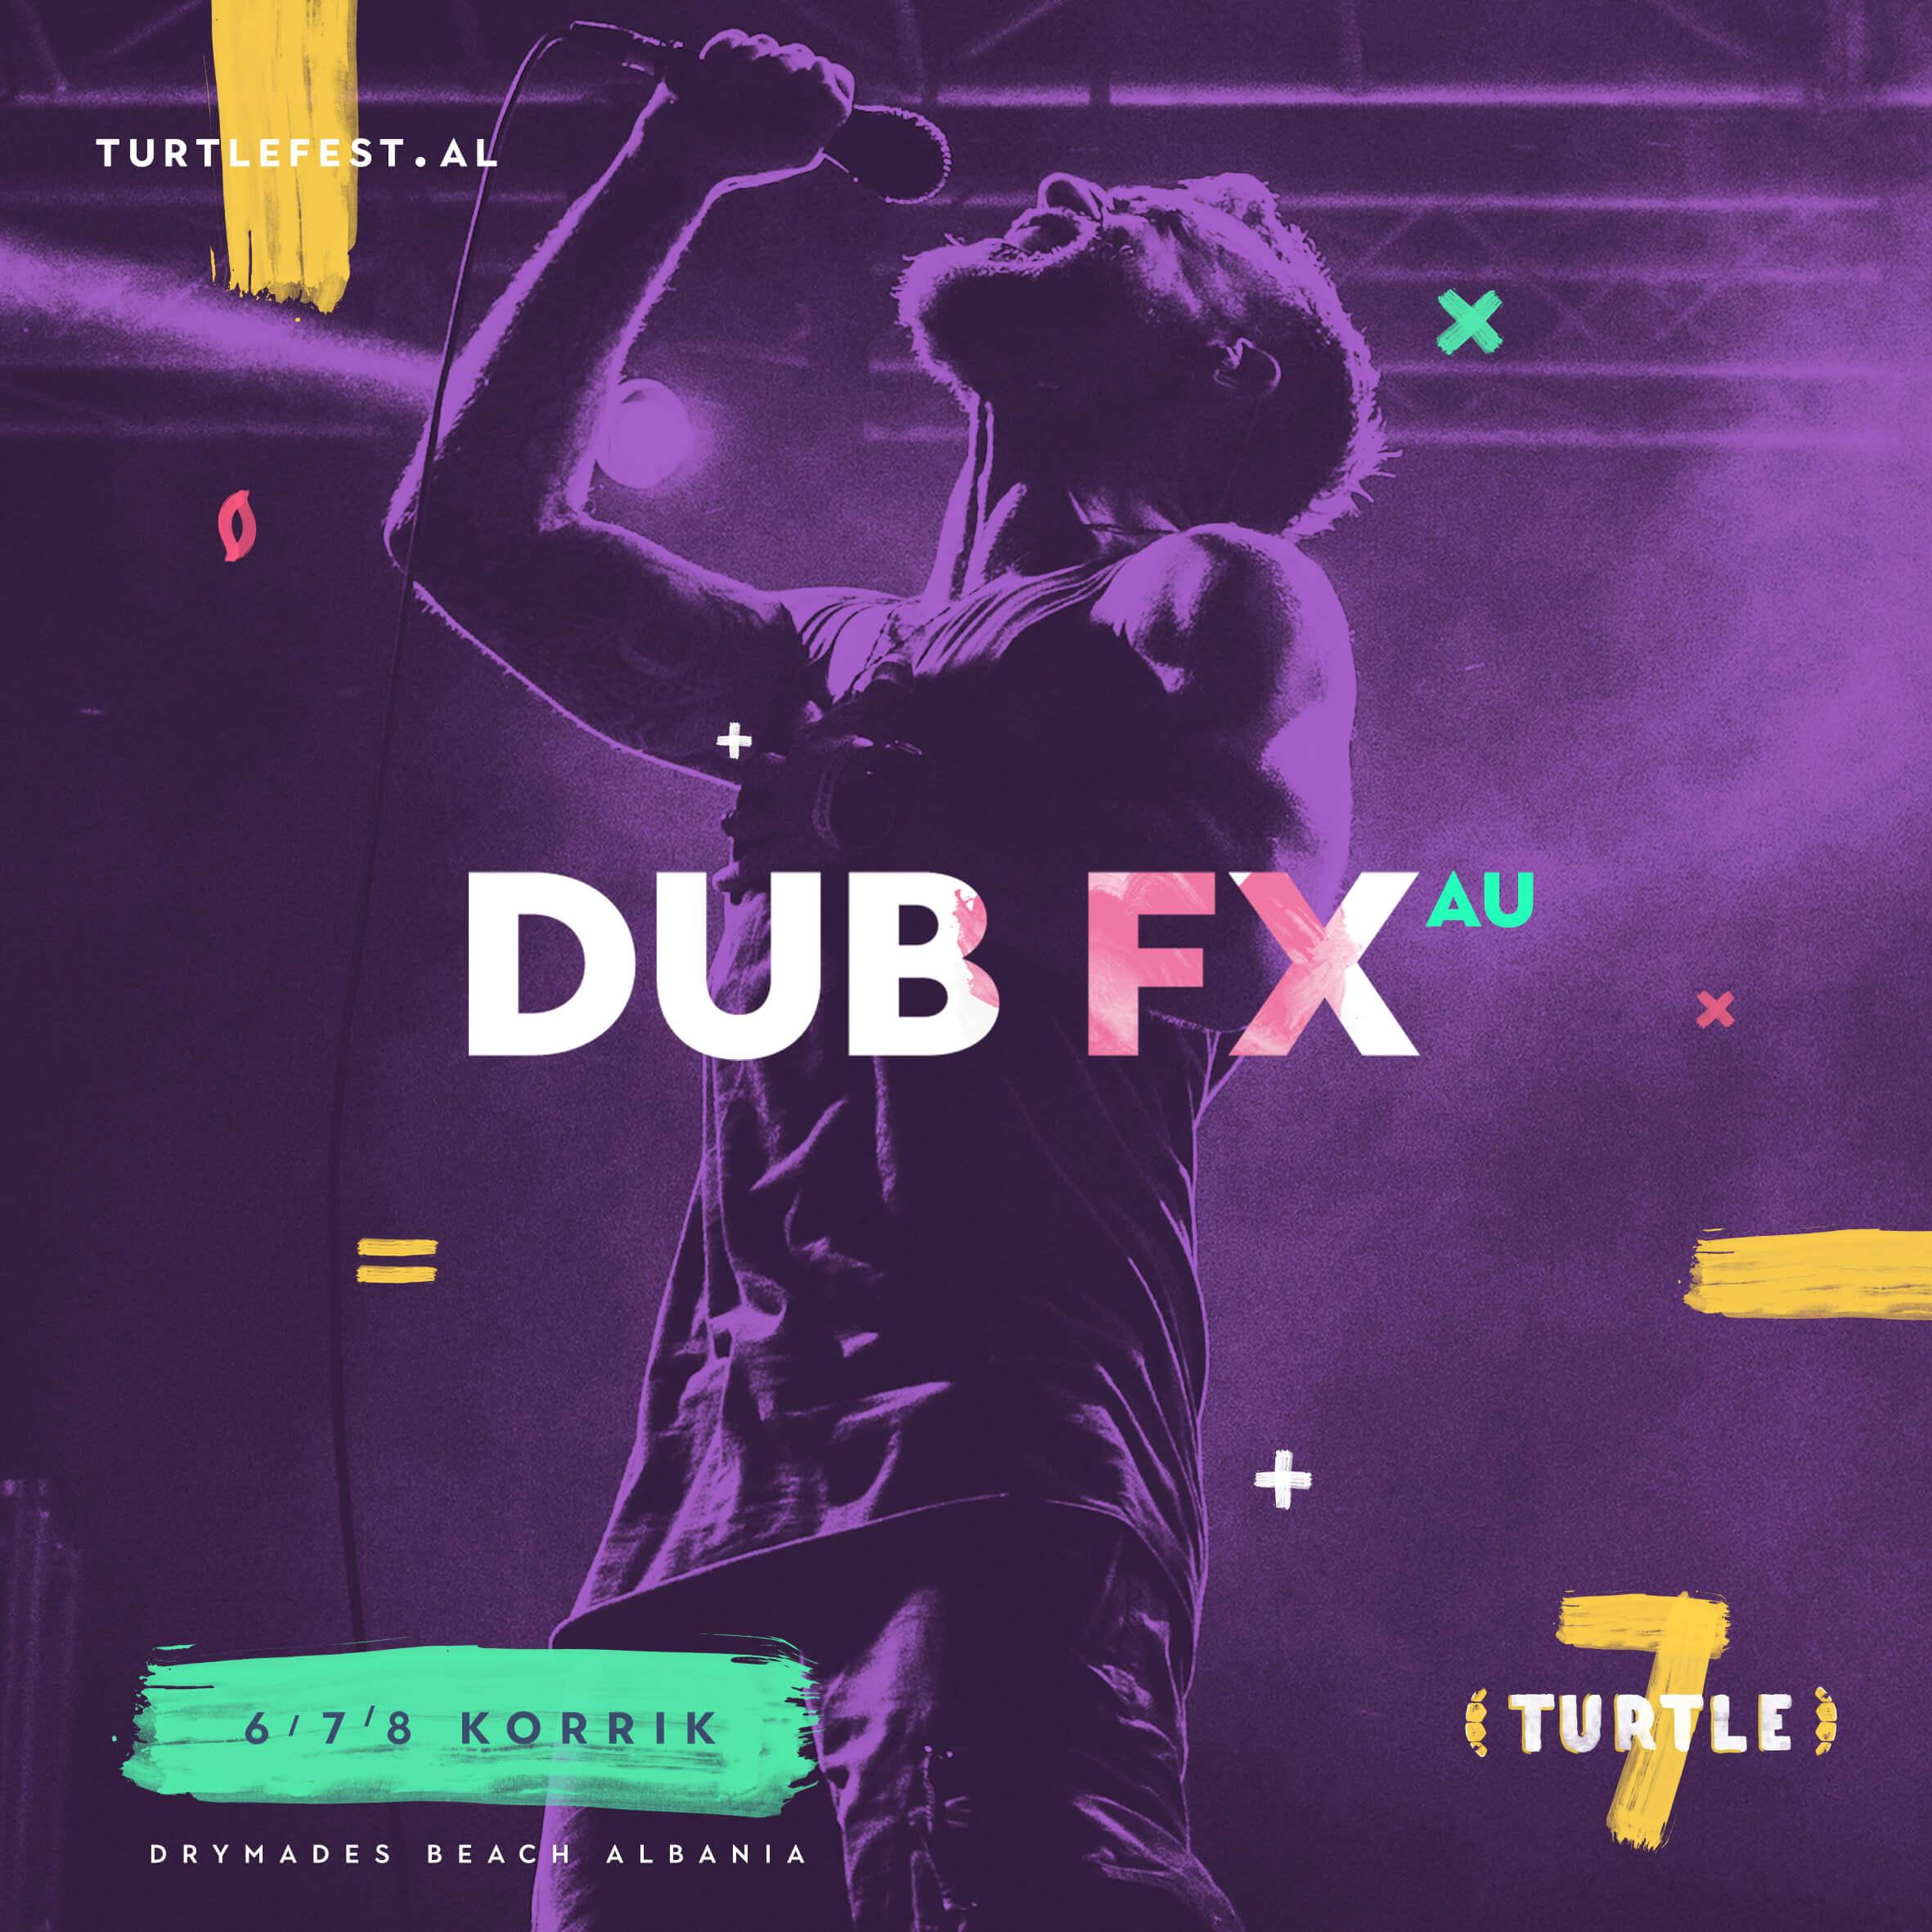 Dub FX - Turtle Fest